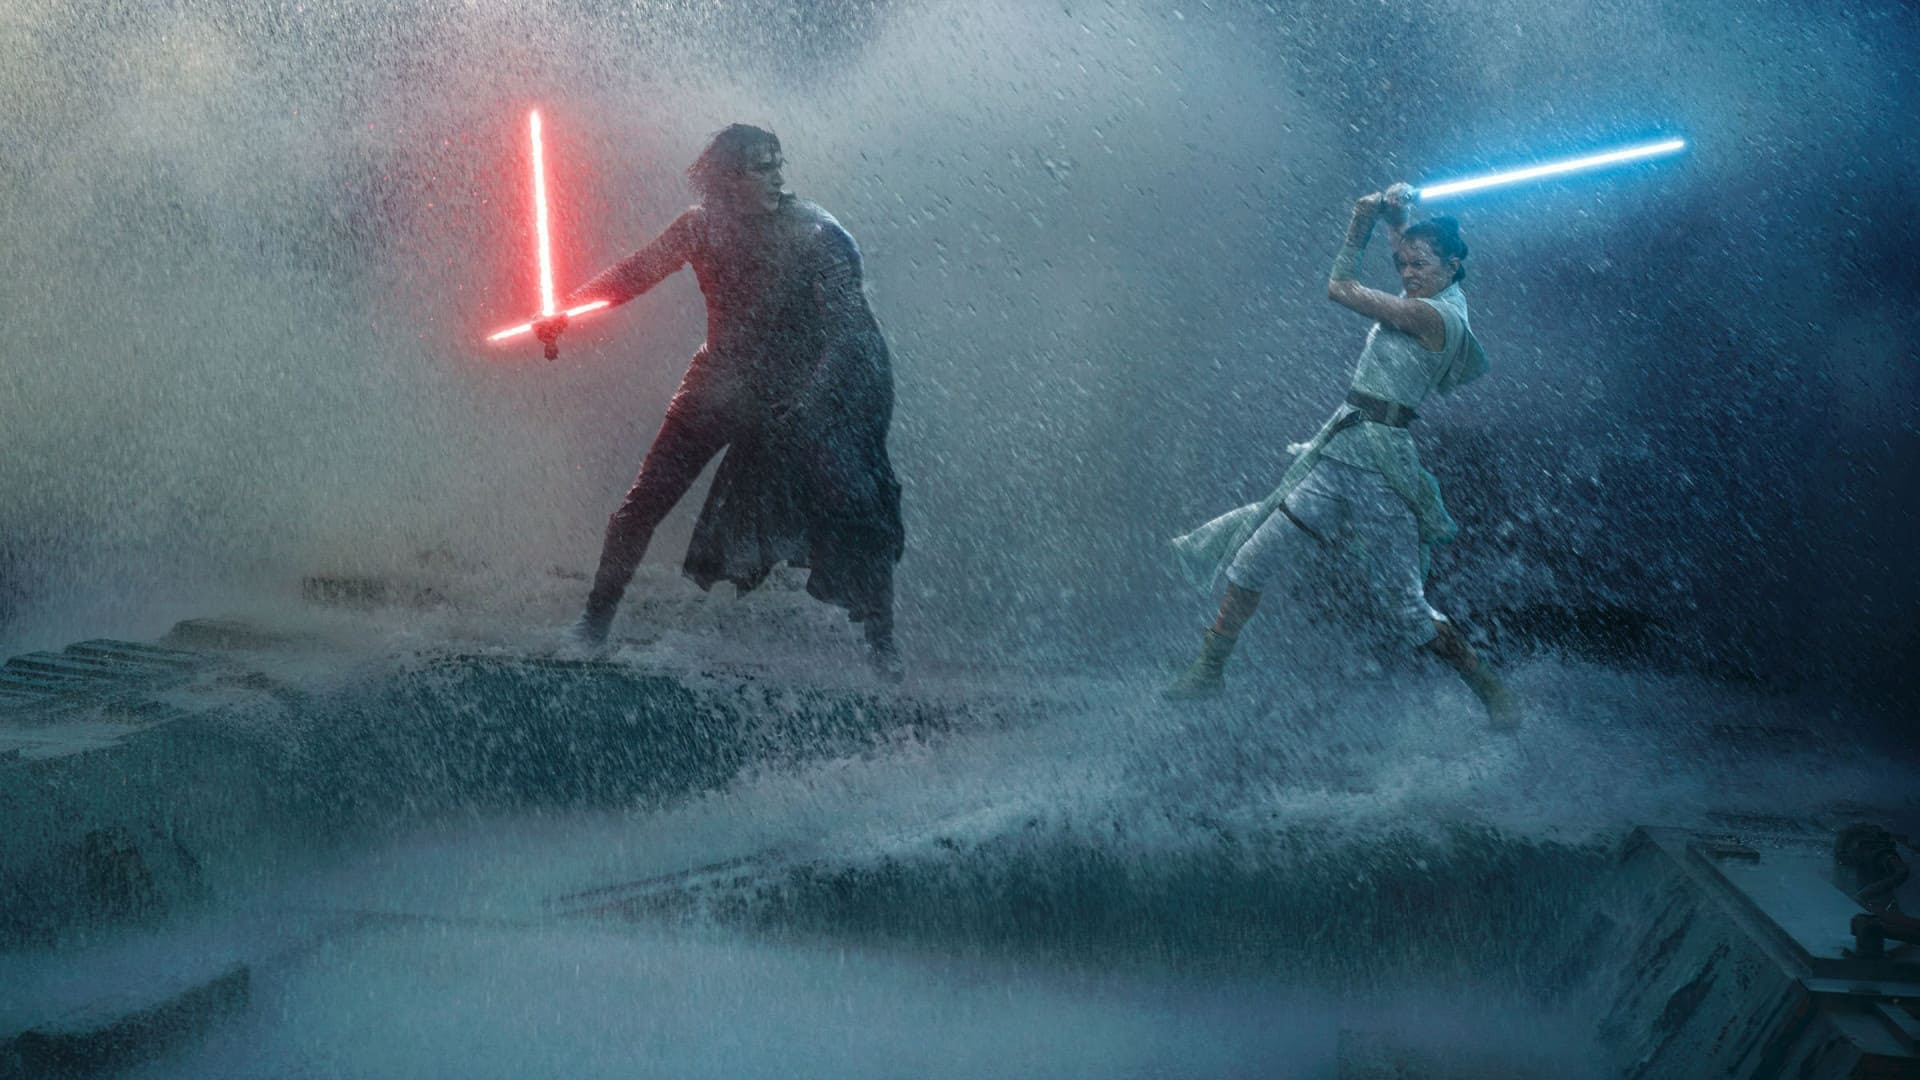 Star Wars Wallpapers Top 95 Best Star Wars Backgrounds Download